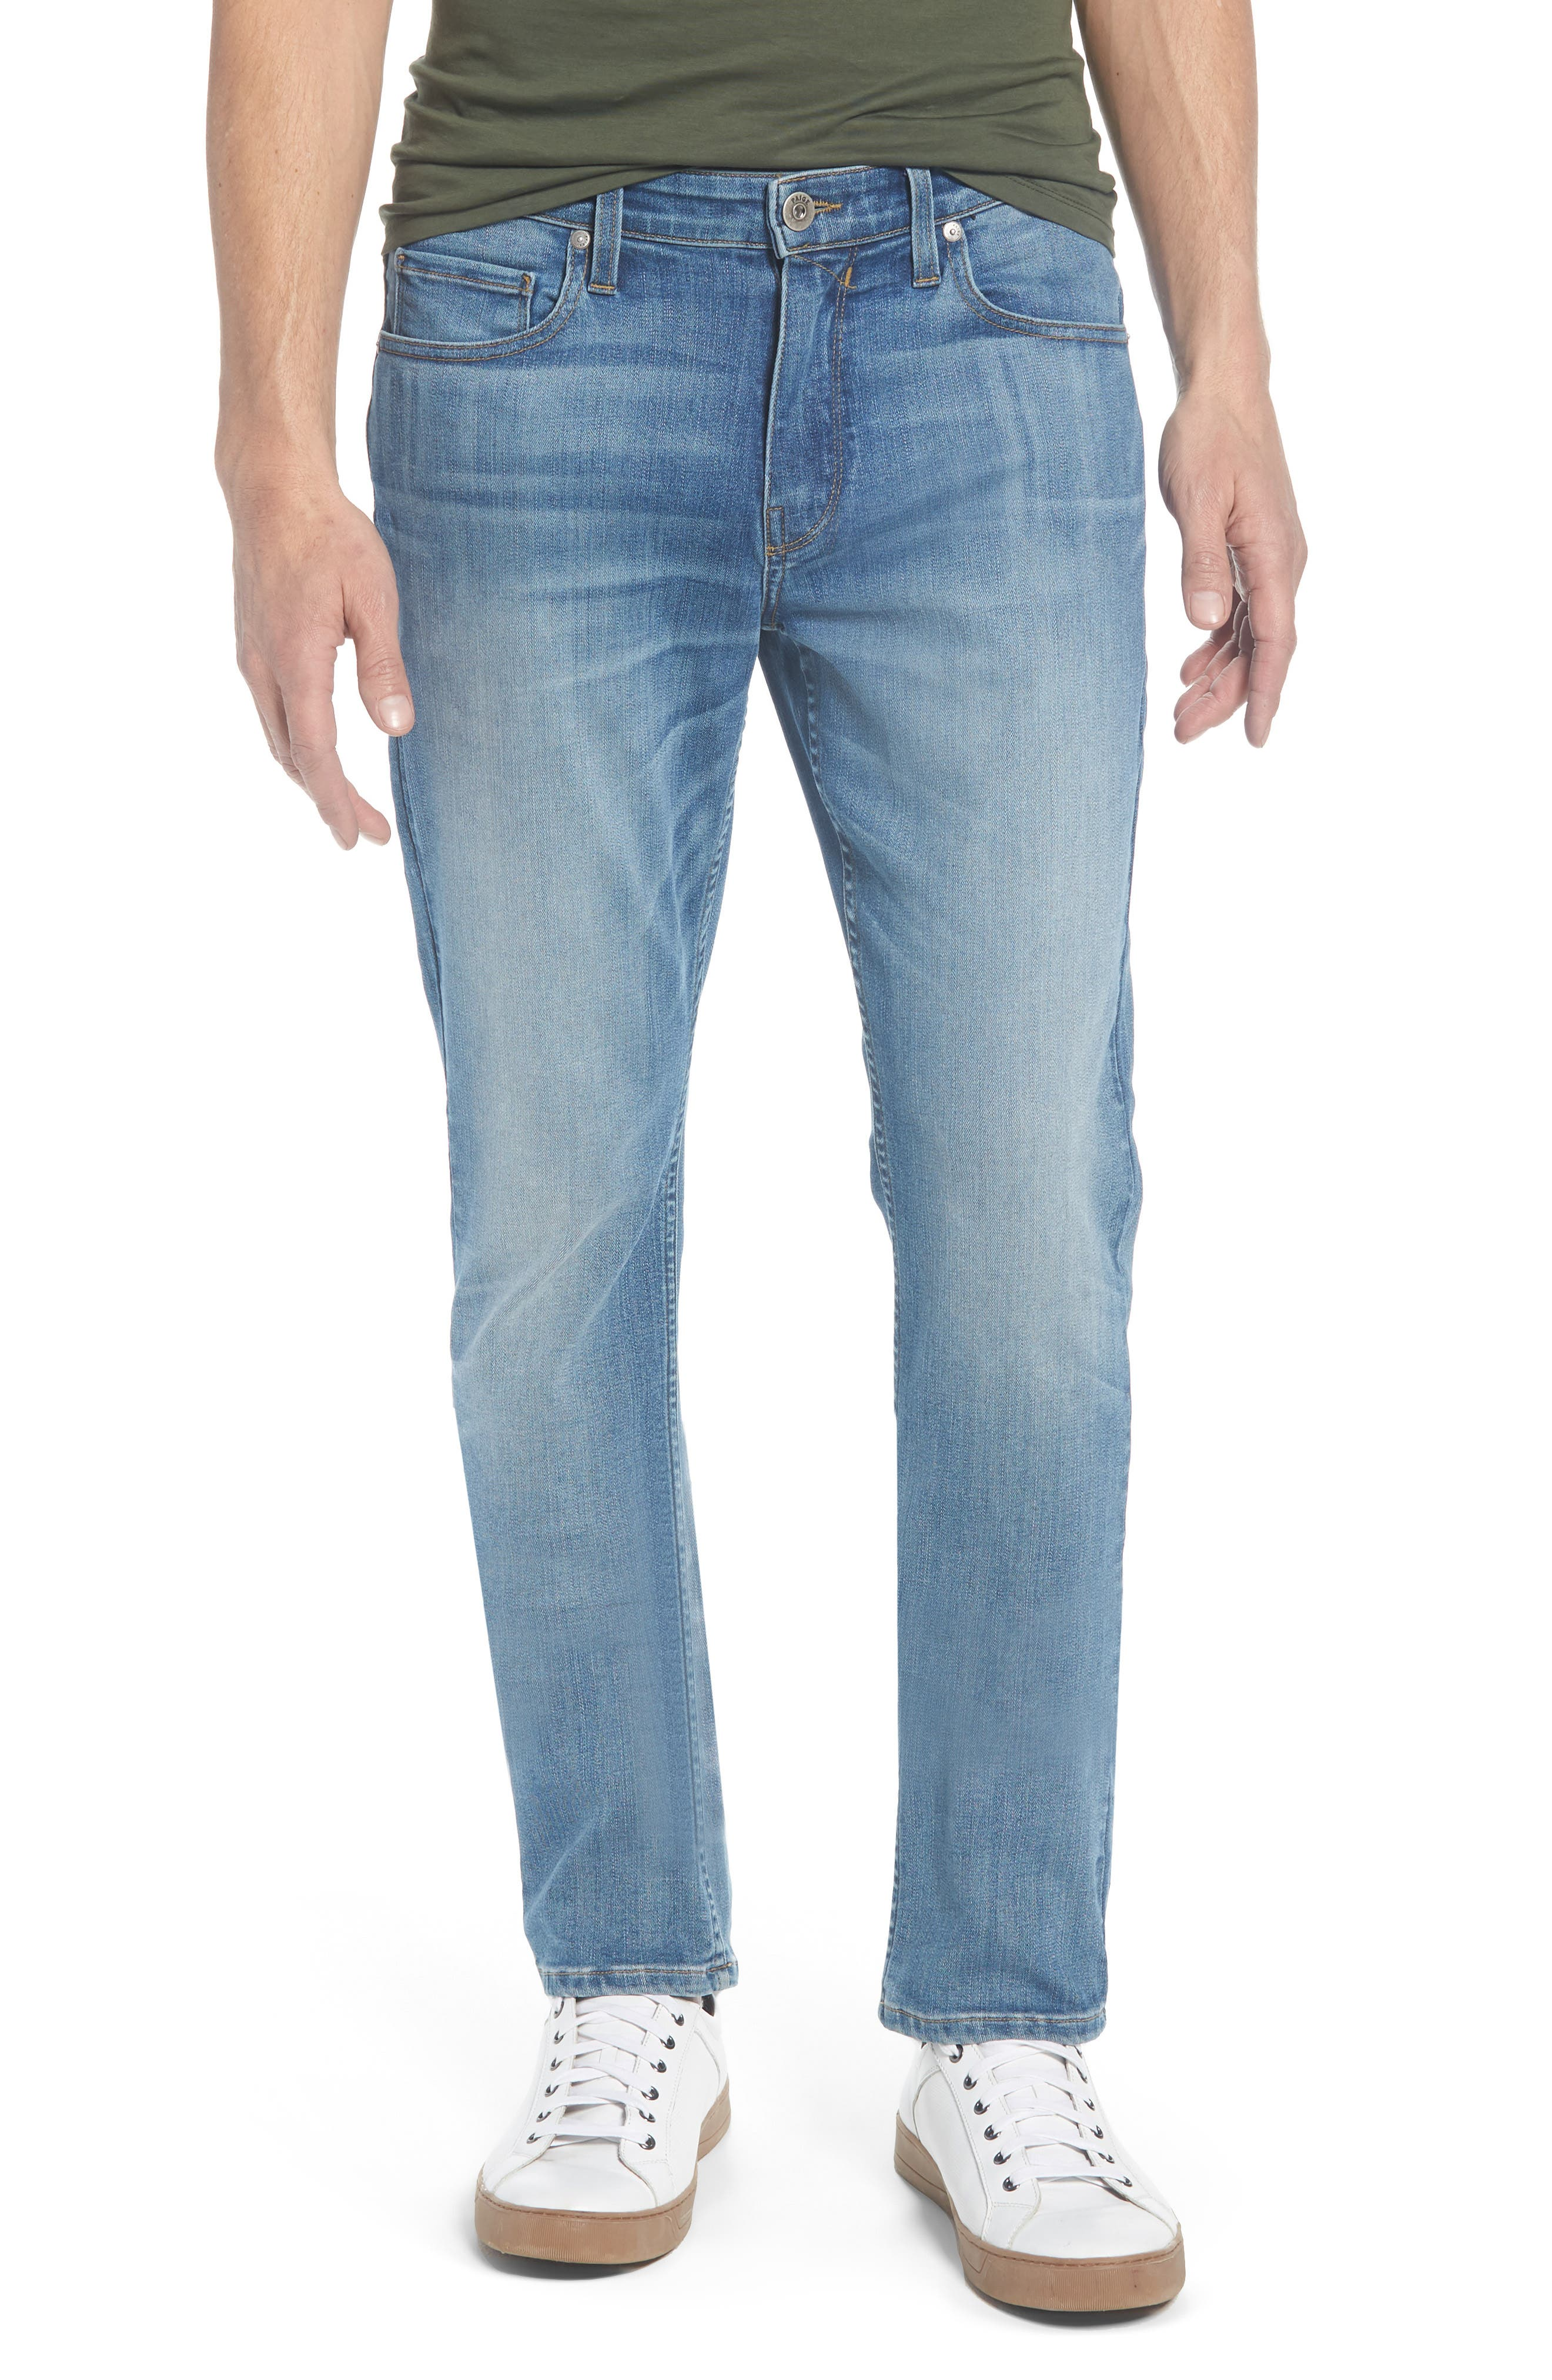 Transcend - Lennox Slim Fit Jeans,                         Main,                         color, CARTWRIGHT